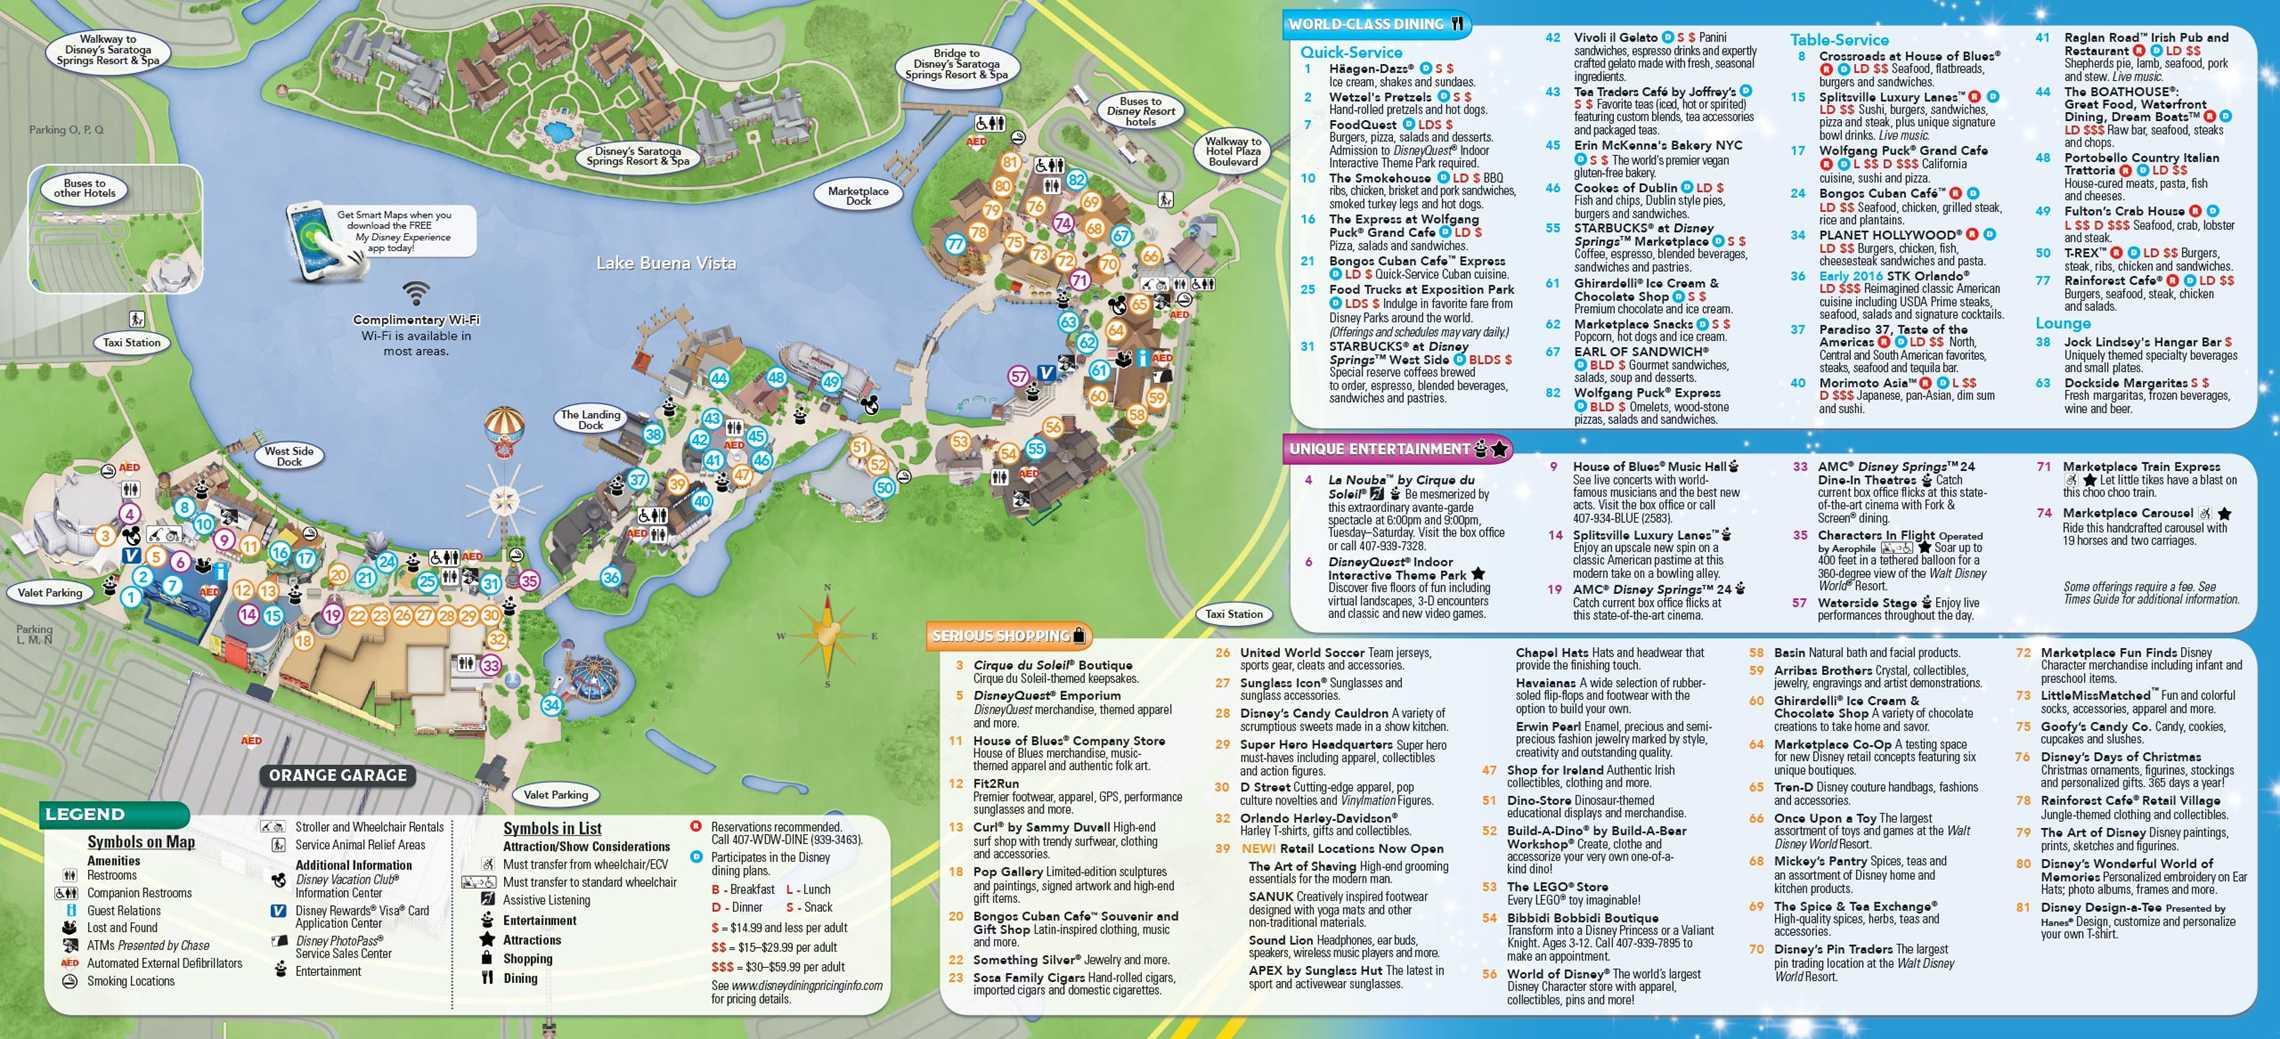 Disney Springs guide map - Back